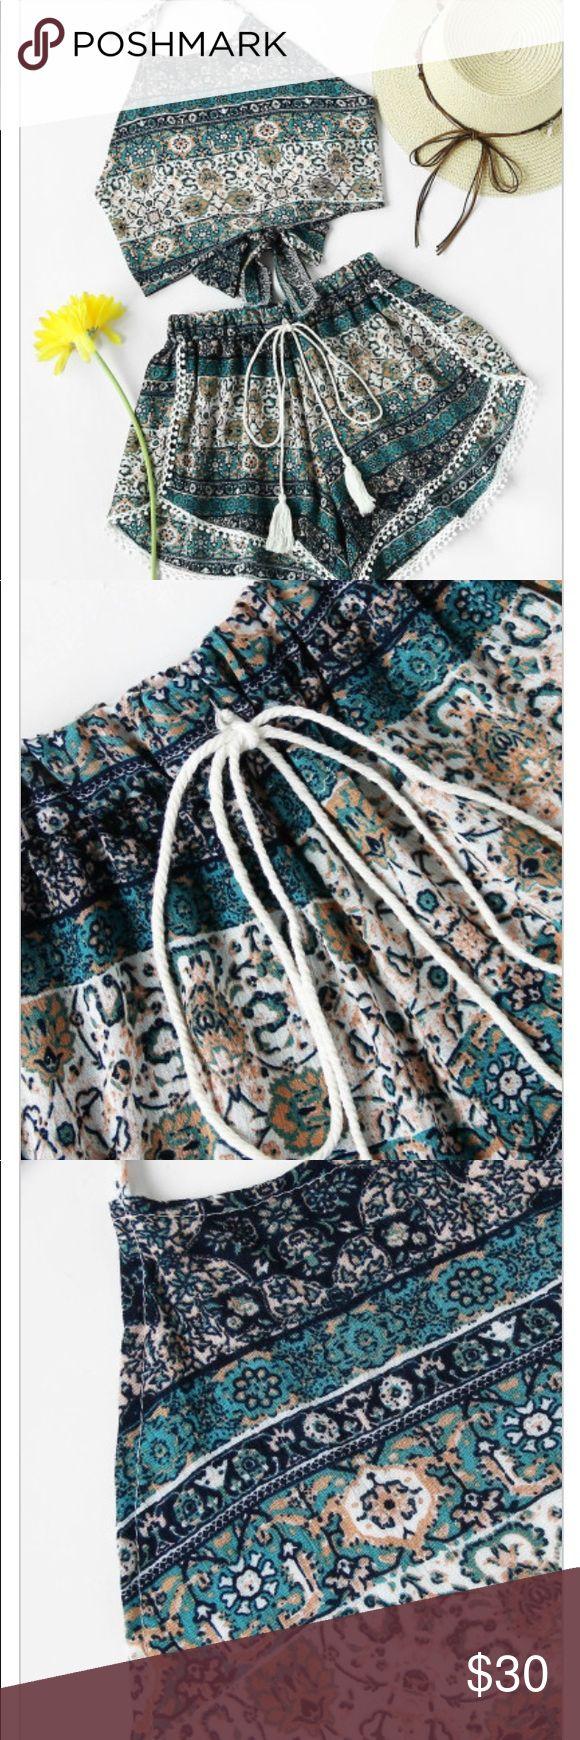 Aztec Two Piece Bow Tie Aztec Print Bow Tie Open Back With Pompom Shorts Belt : NO Fabric : Fabric has no stretch Season : Summer Suit Type : Shorts Pattern Type : Tribal Print Bust(cm) : S:92cm, M:96cm, L:100cm, XL:104cm Waist Size(cm) : S:52-96cm, M:56-100cm, L:60-104cm, XL:64-108cm Hip Size(cm) : S:96cm, M:100cm, L:104cm, XL:108cm Thigh(cm) : S:74cm, M:76cm, L:78cm, XL:80cm Size Available : S,M,L,XL Shorts Length(cm) : S:25cm, M:26cm, L:27cm, XL:28cm Top Length(cm) : S:34cm, M:35cm…